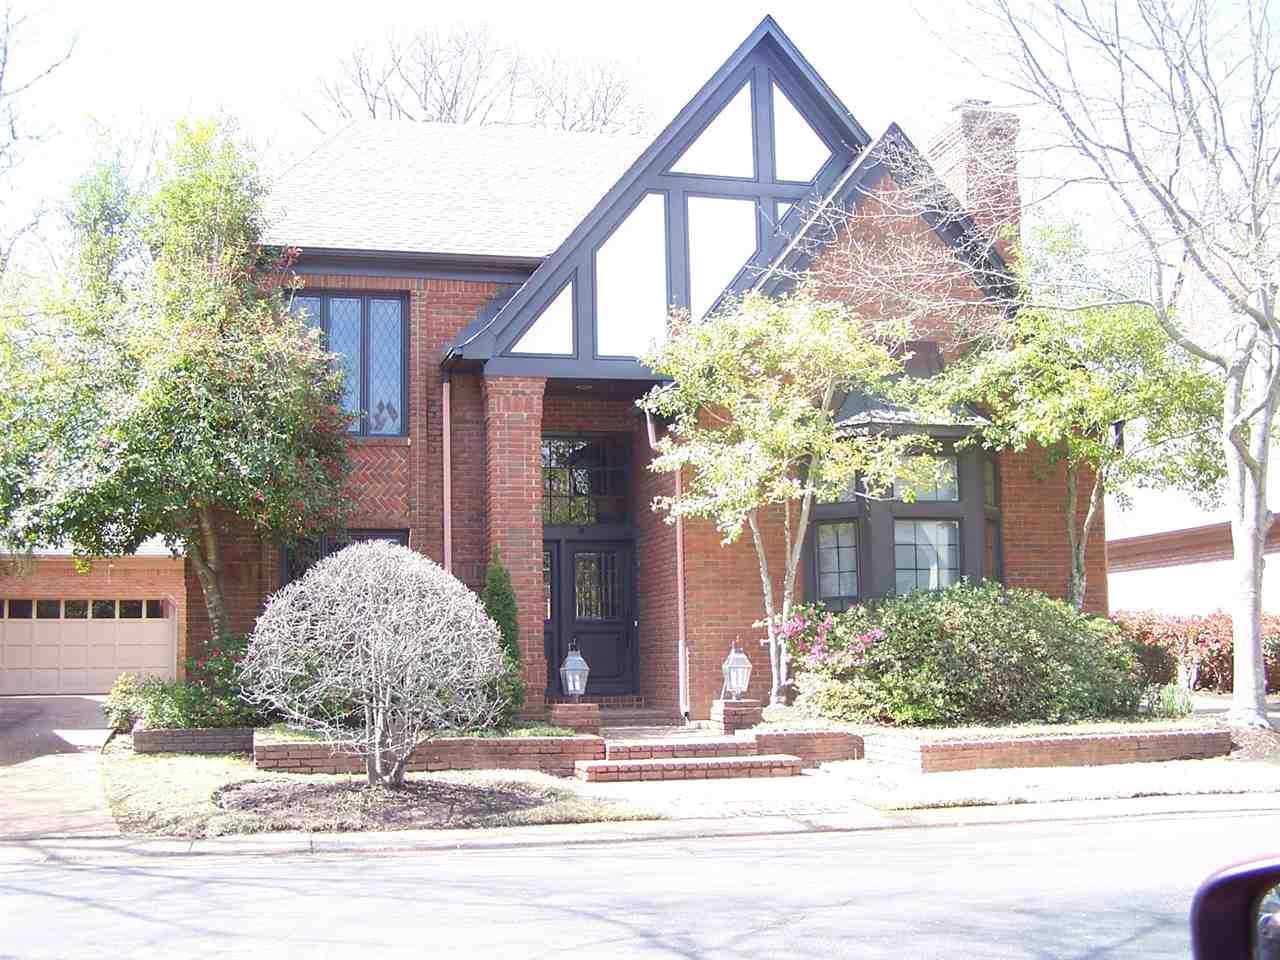 937 W RIVERWALK DR, Memphis, TN 38120